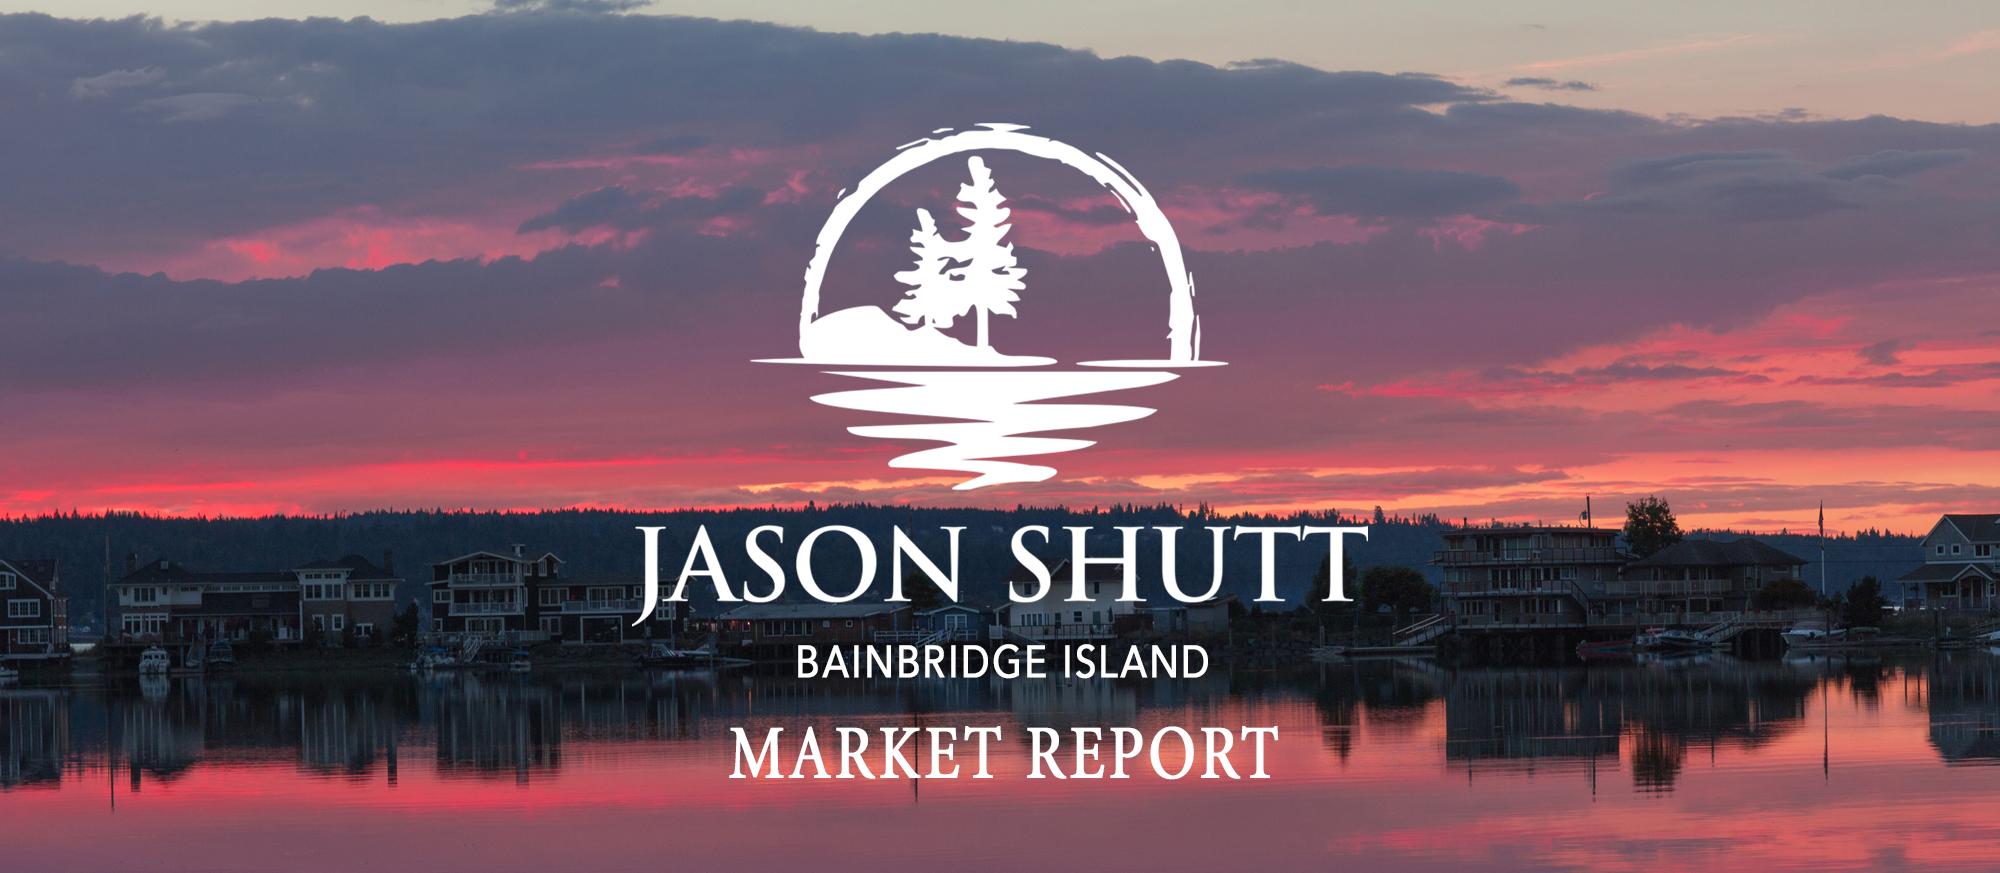 Bainbridge-Island-Market-Report-Real-Estate-Blog-Nov-2020-2.png